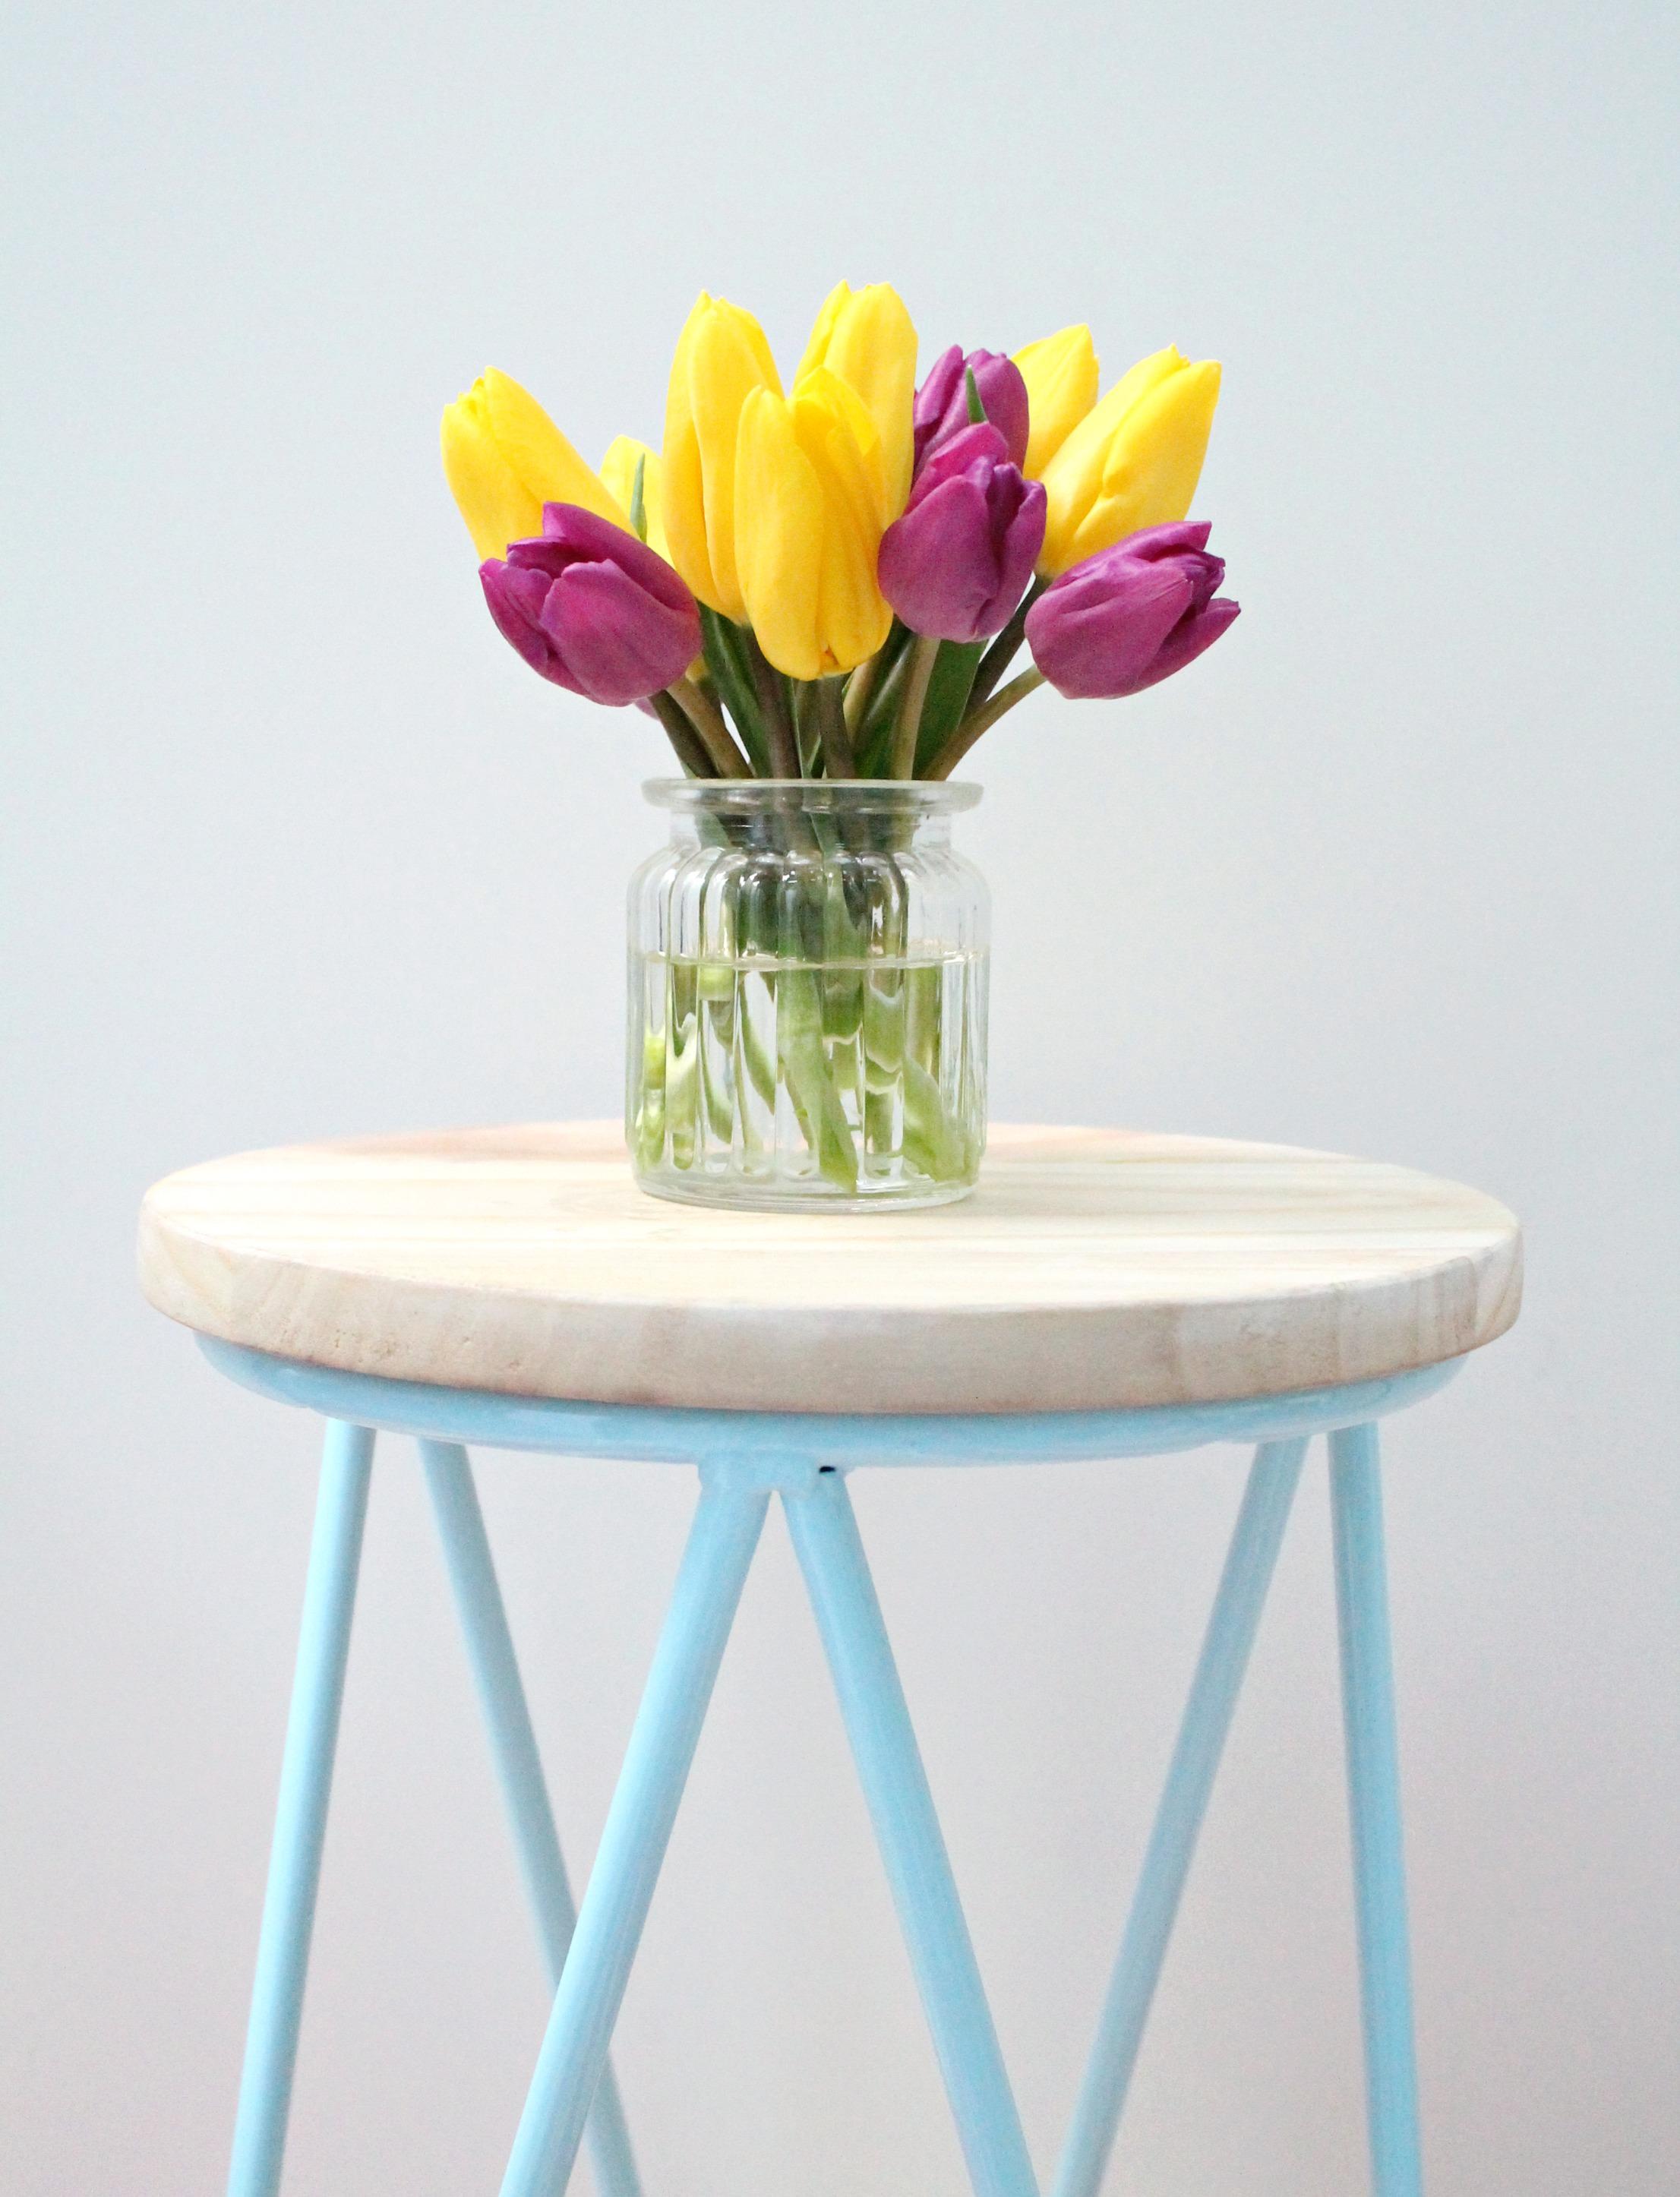 Pretty-tulips-on-blue-stool-photo-by-Geraldine-Tan